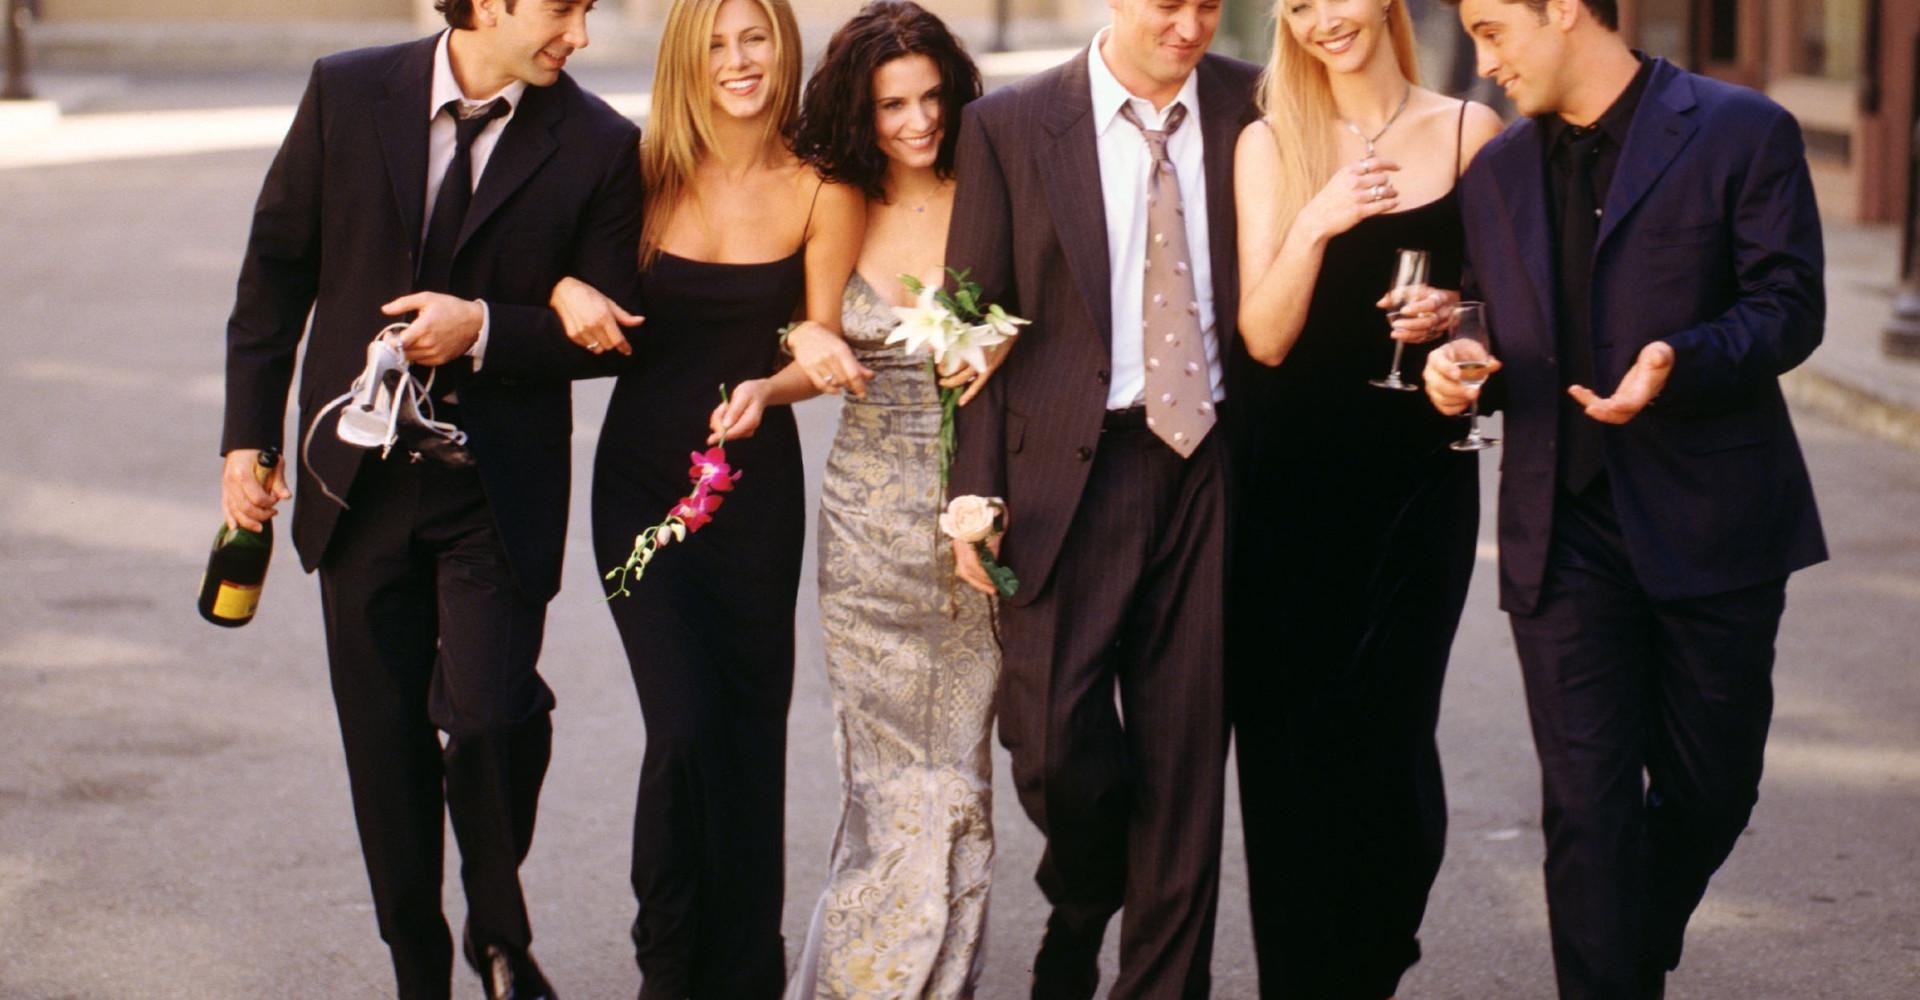 Jennifer Aniston reveals who shot down 'Friends' revival